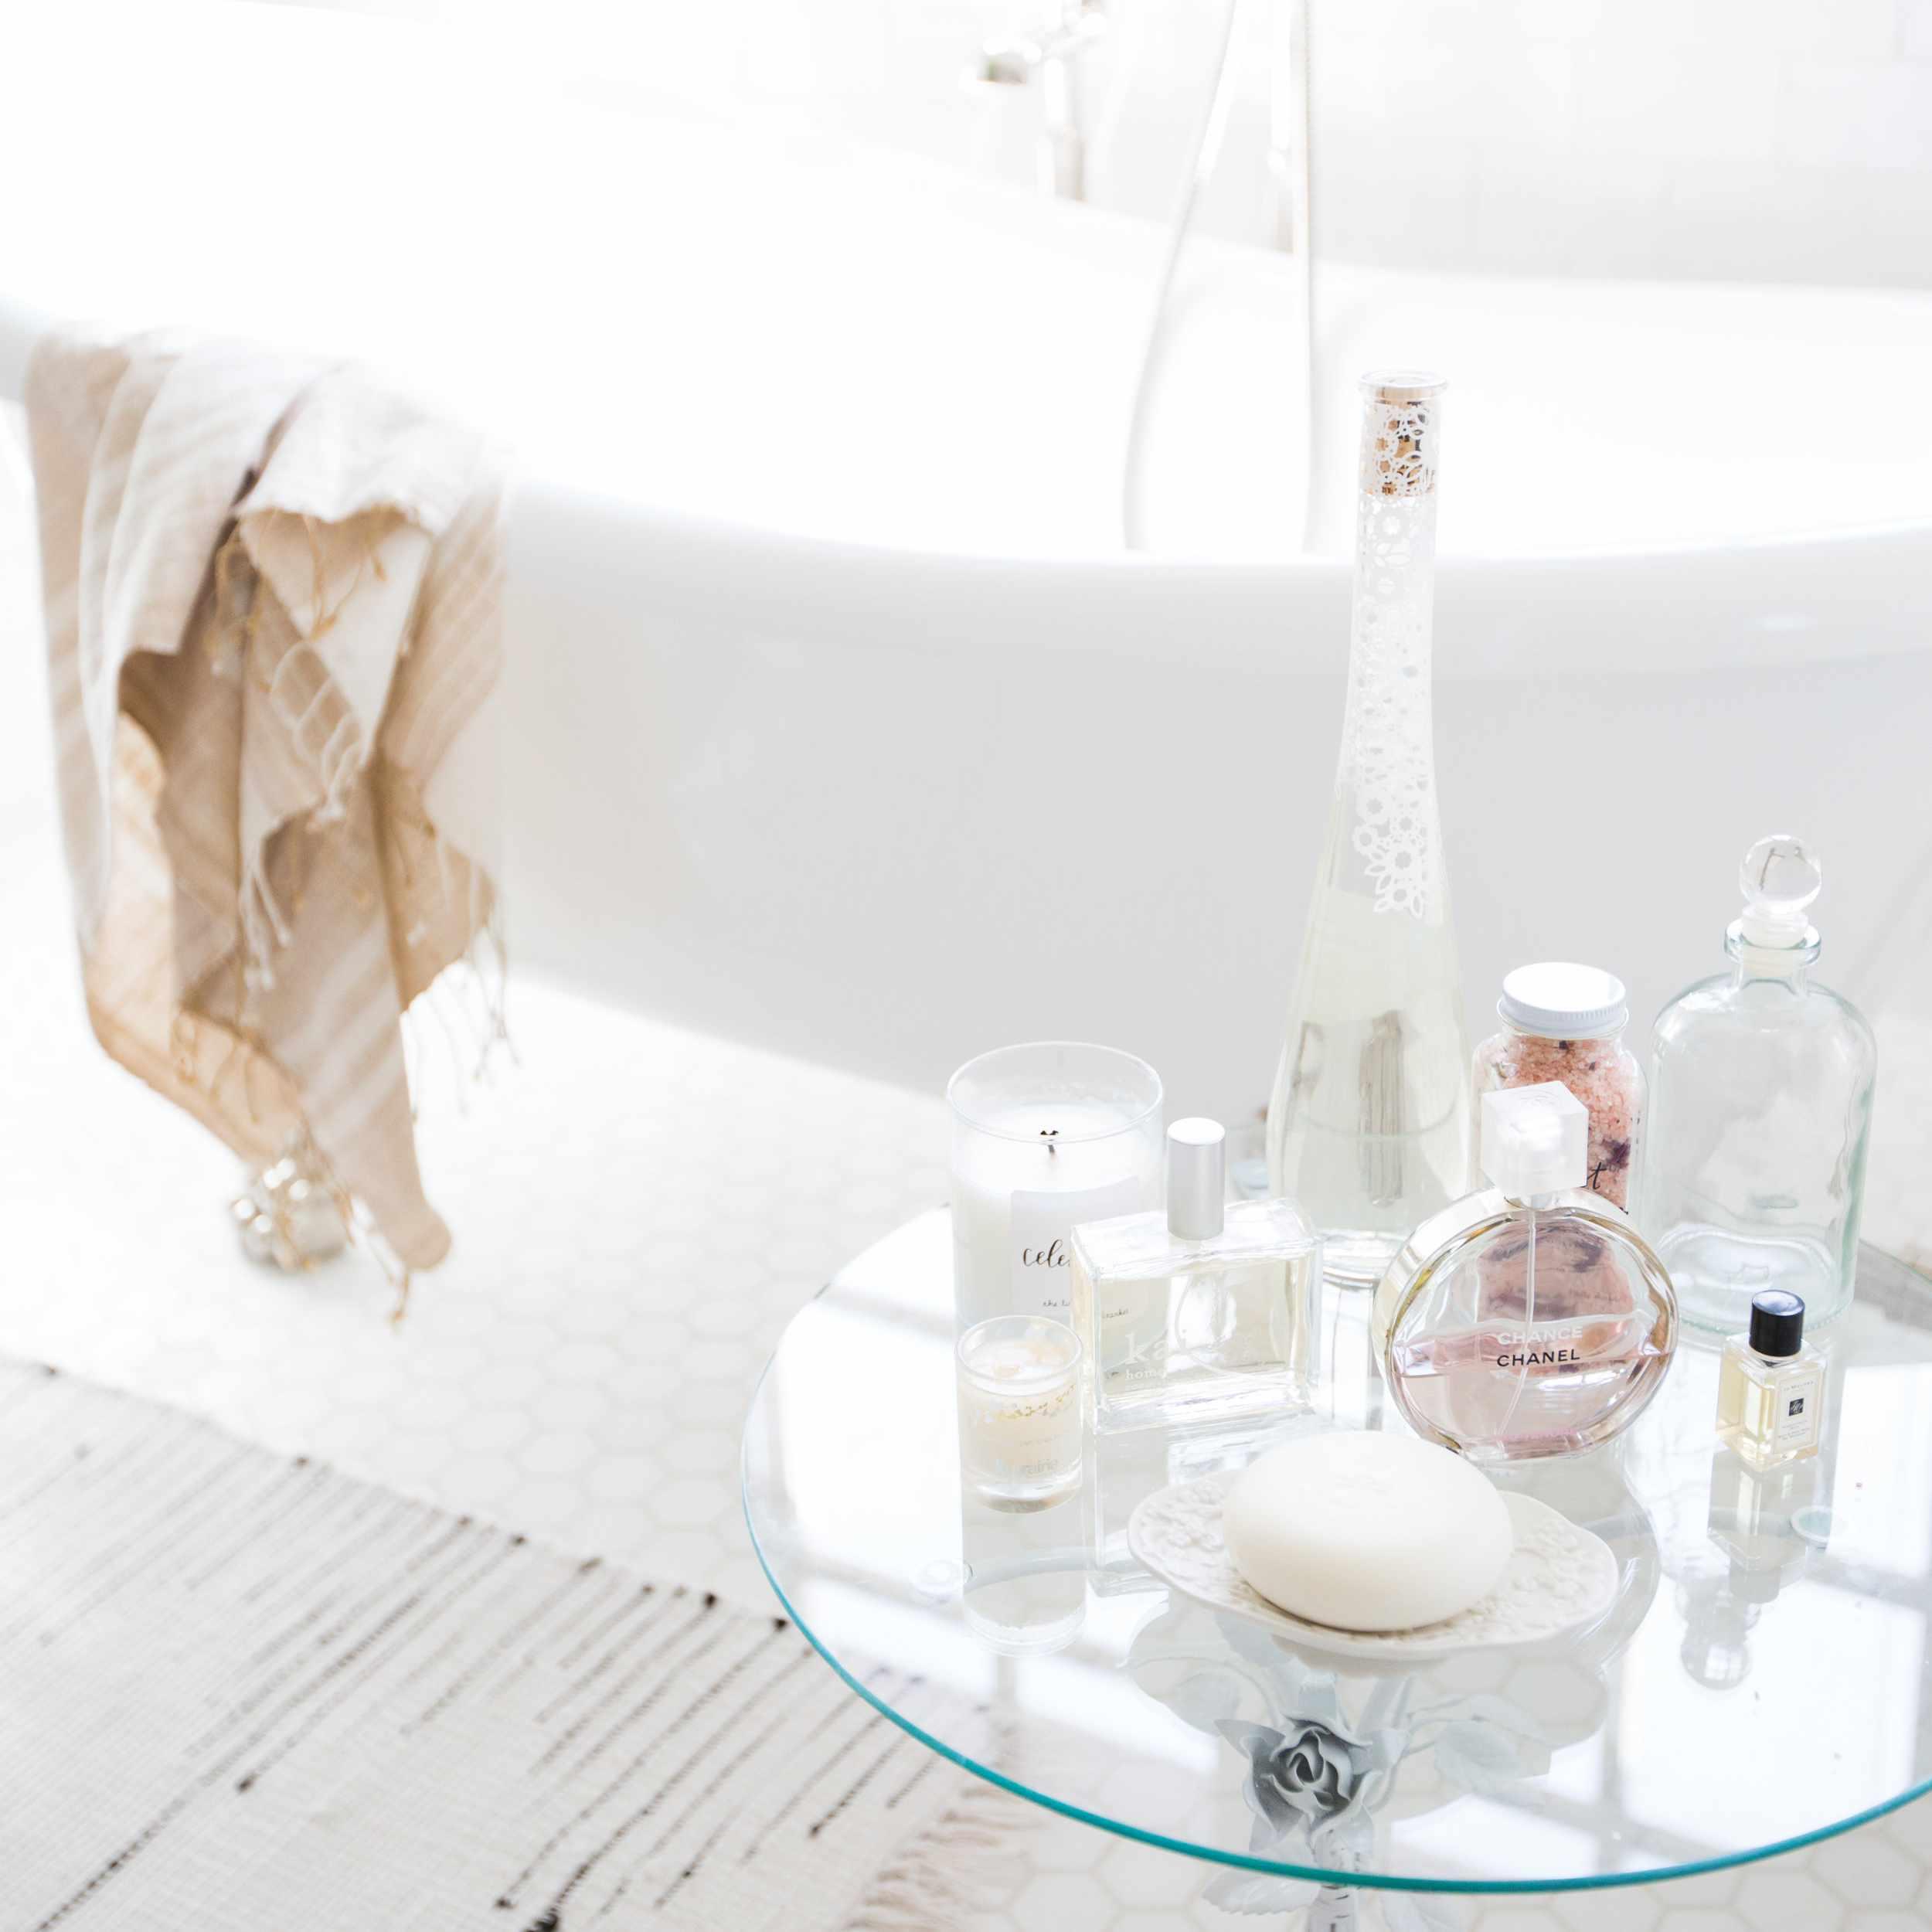 Perfumes on display in bathroom.